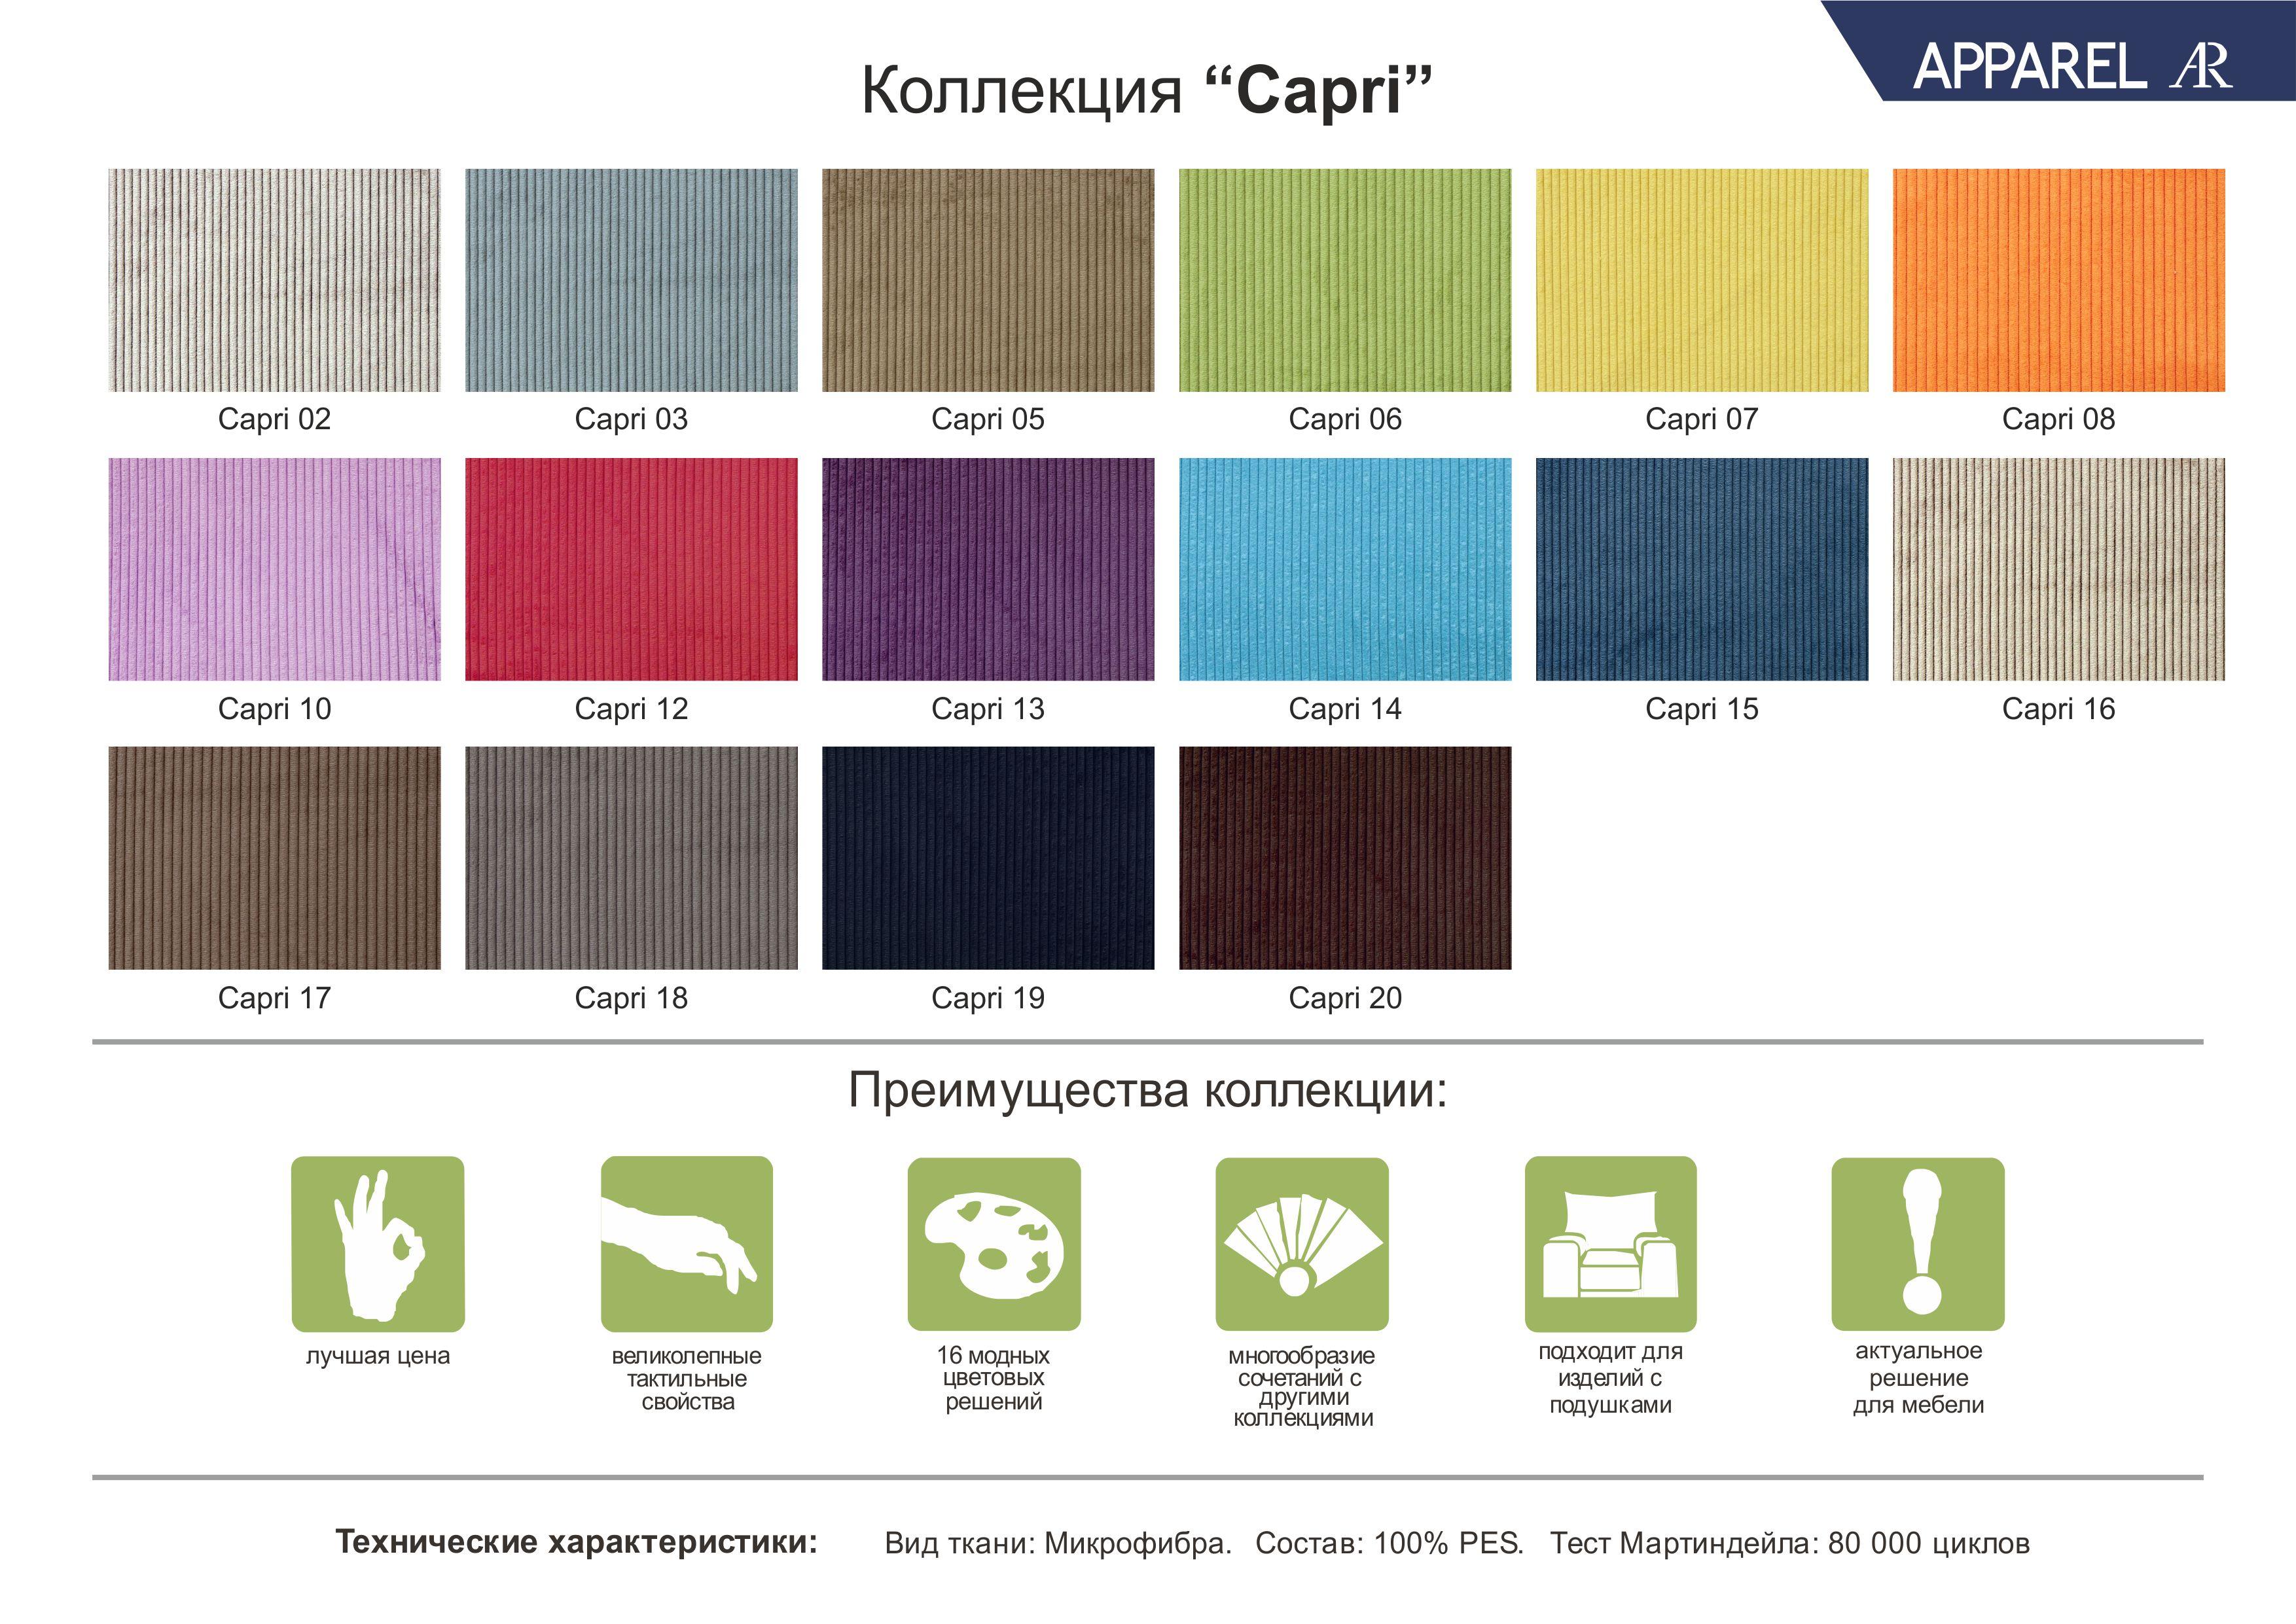 Картинки по запросу apparel capri